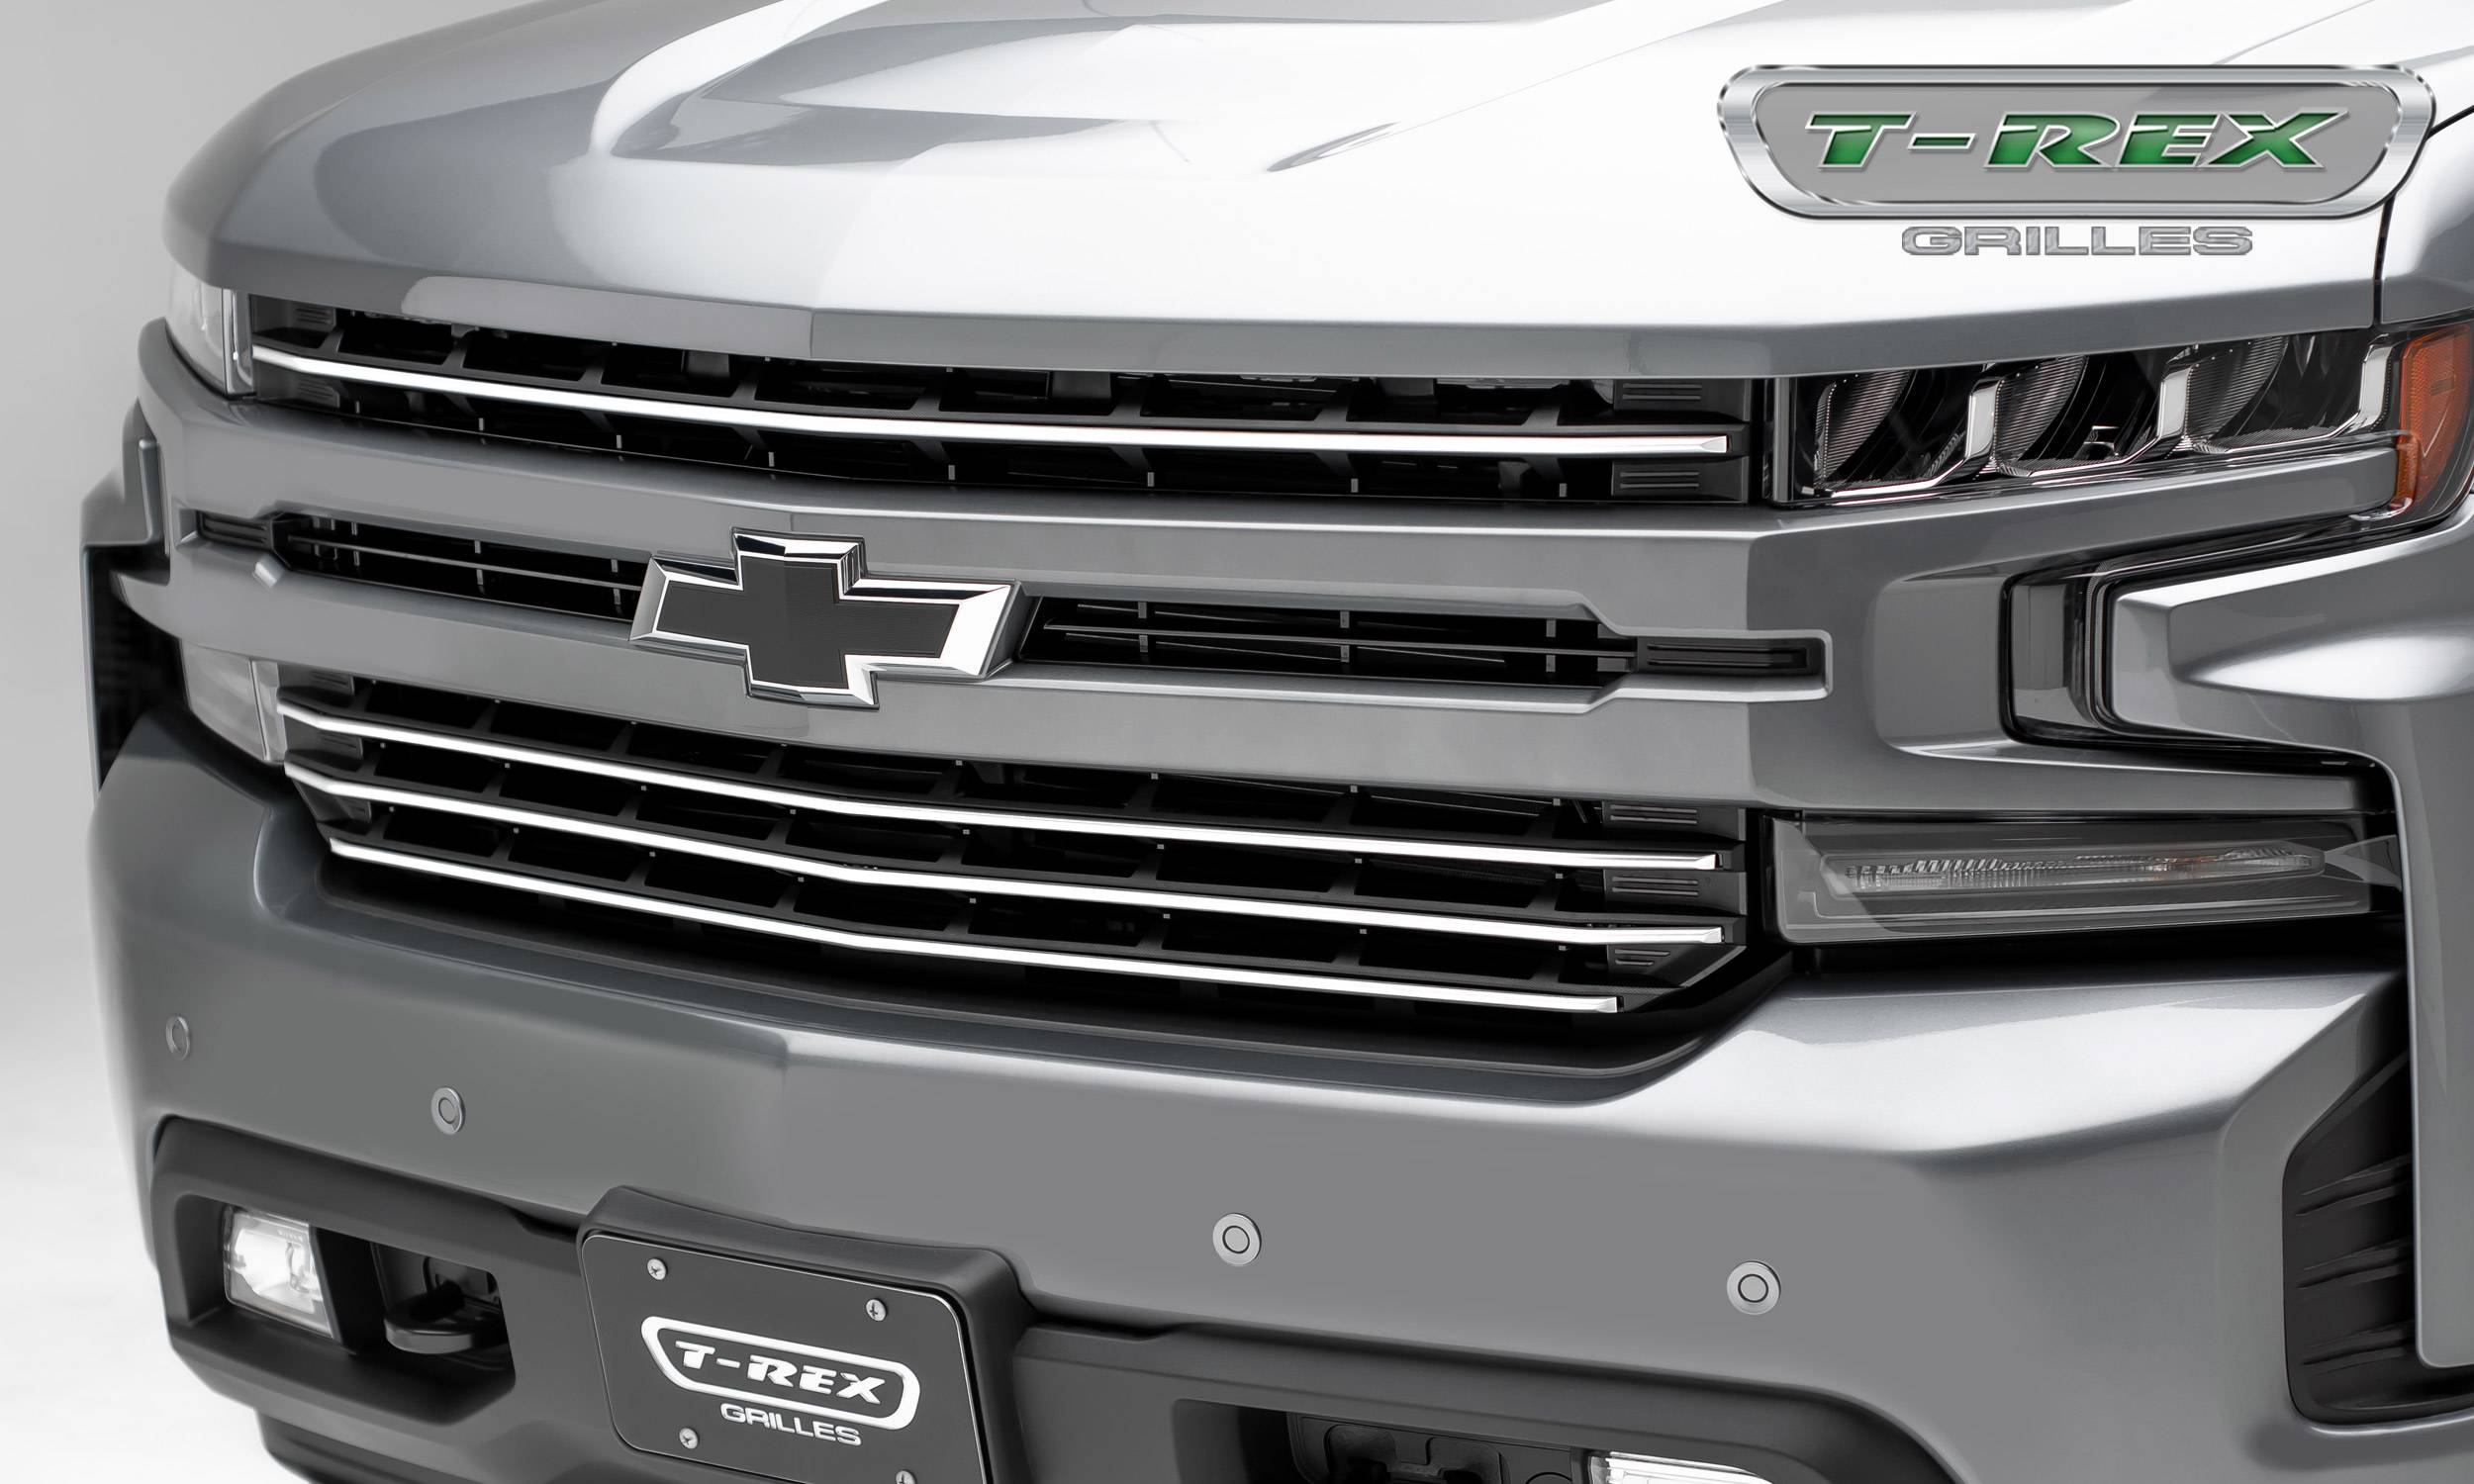 T-REX Grilles - Chevrolet Silverado 1500 2019 Billet Grille, Horizontal Round, Silver Powder Coat Finish, Aluminum, 4 Pc, Overlay - Pt #6211236